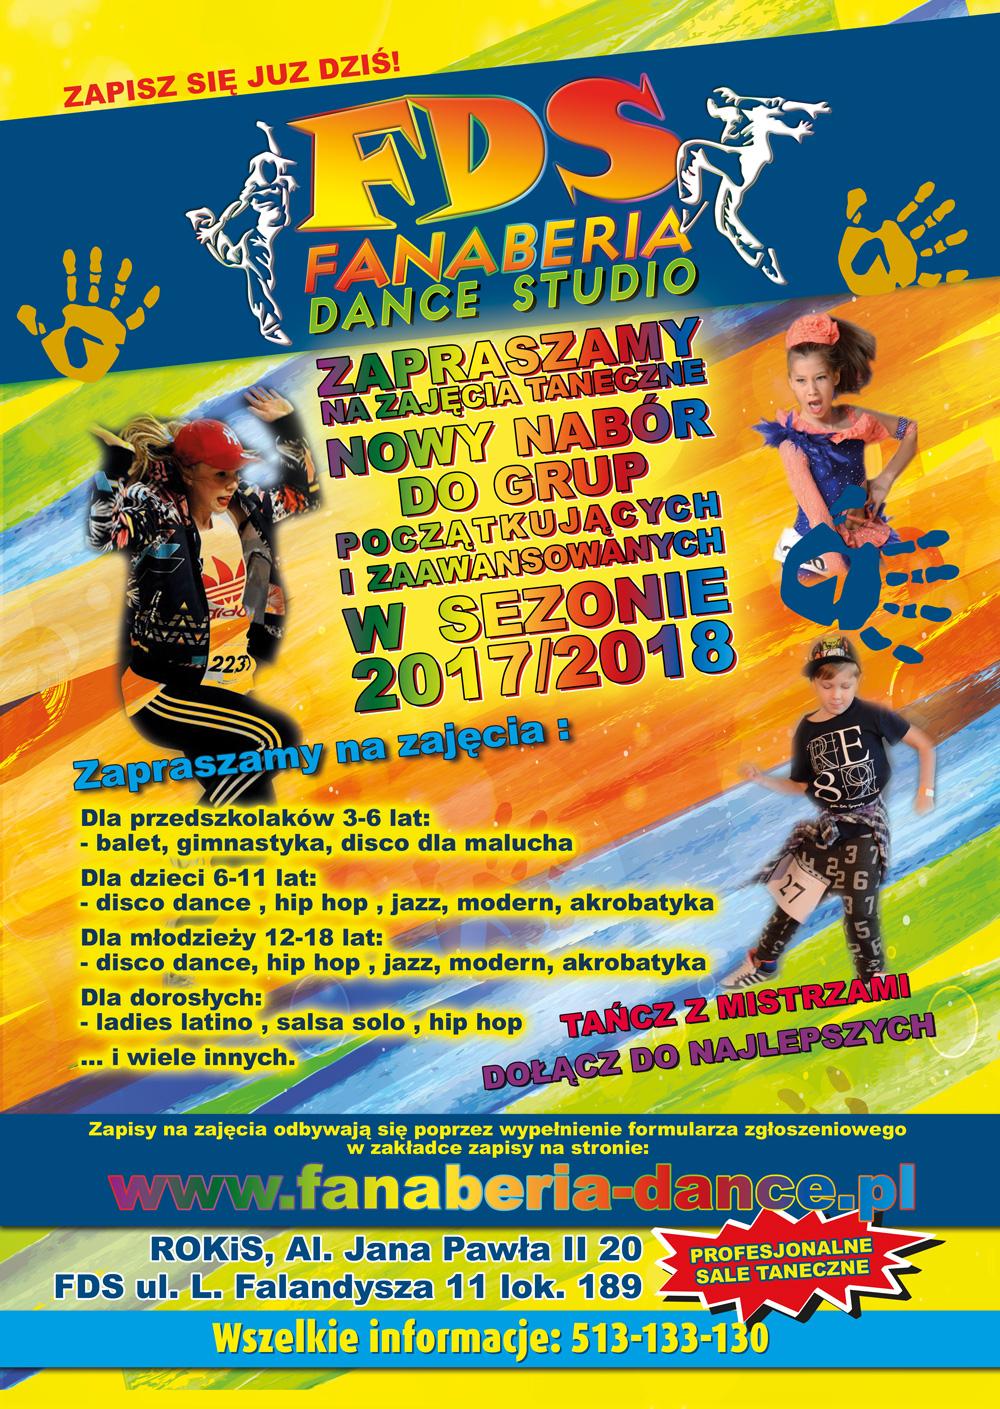 Fanaberia Dance